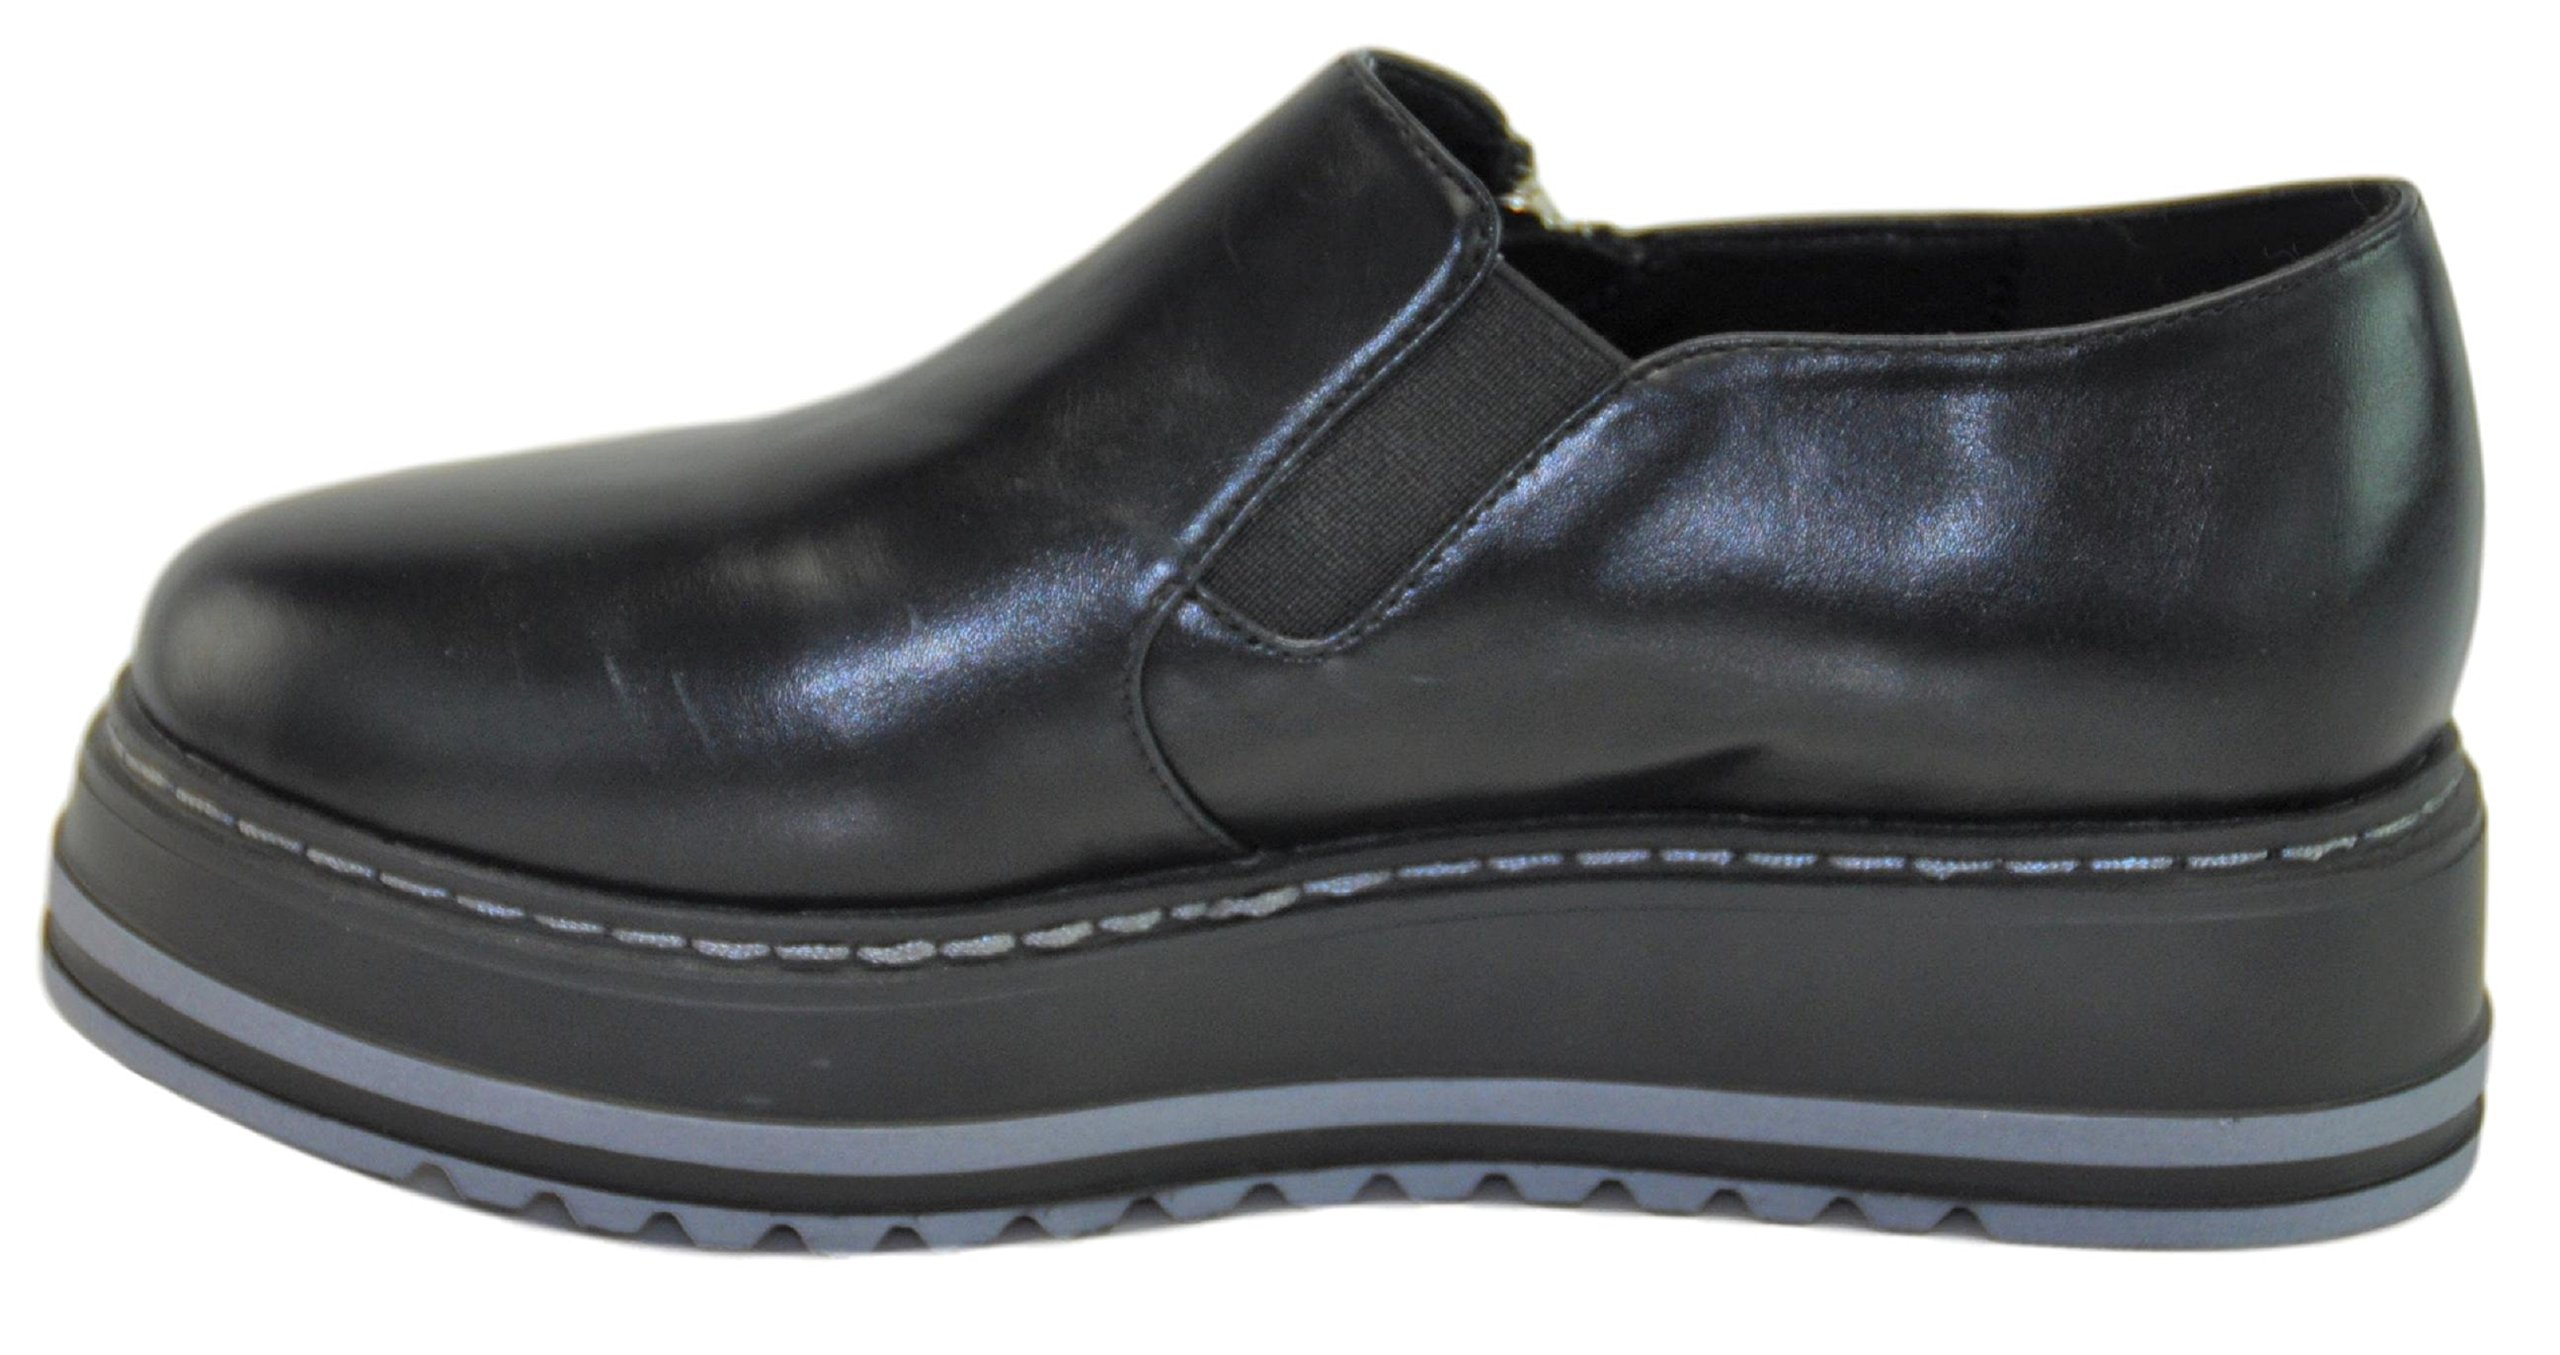 Lynda Black Quality Prime Fashion Slip On Clearance Sale High Heel Creeper Platform Wedge Summer School Oxford Zapatos de Plataforma para Ninas for Youth Teen Girls Women Mujer (Size 5.5, Black) by BDshoes (Image #4)